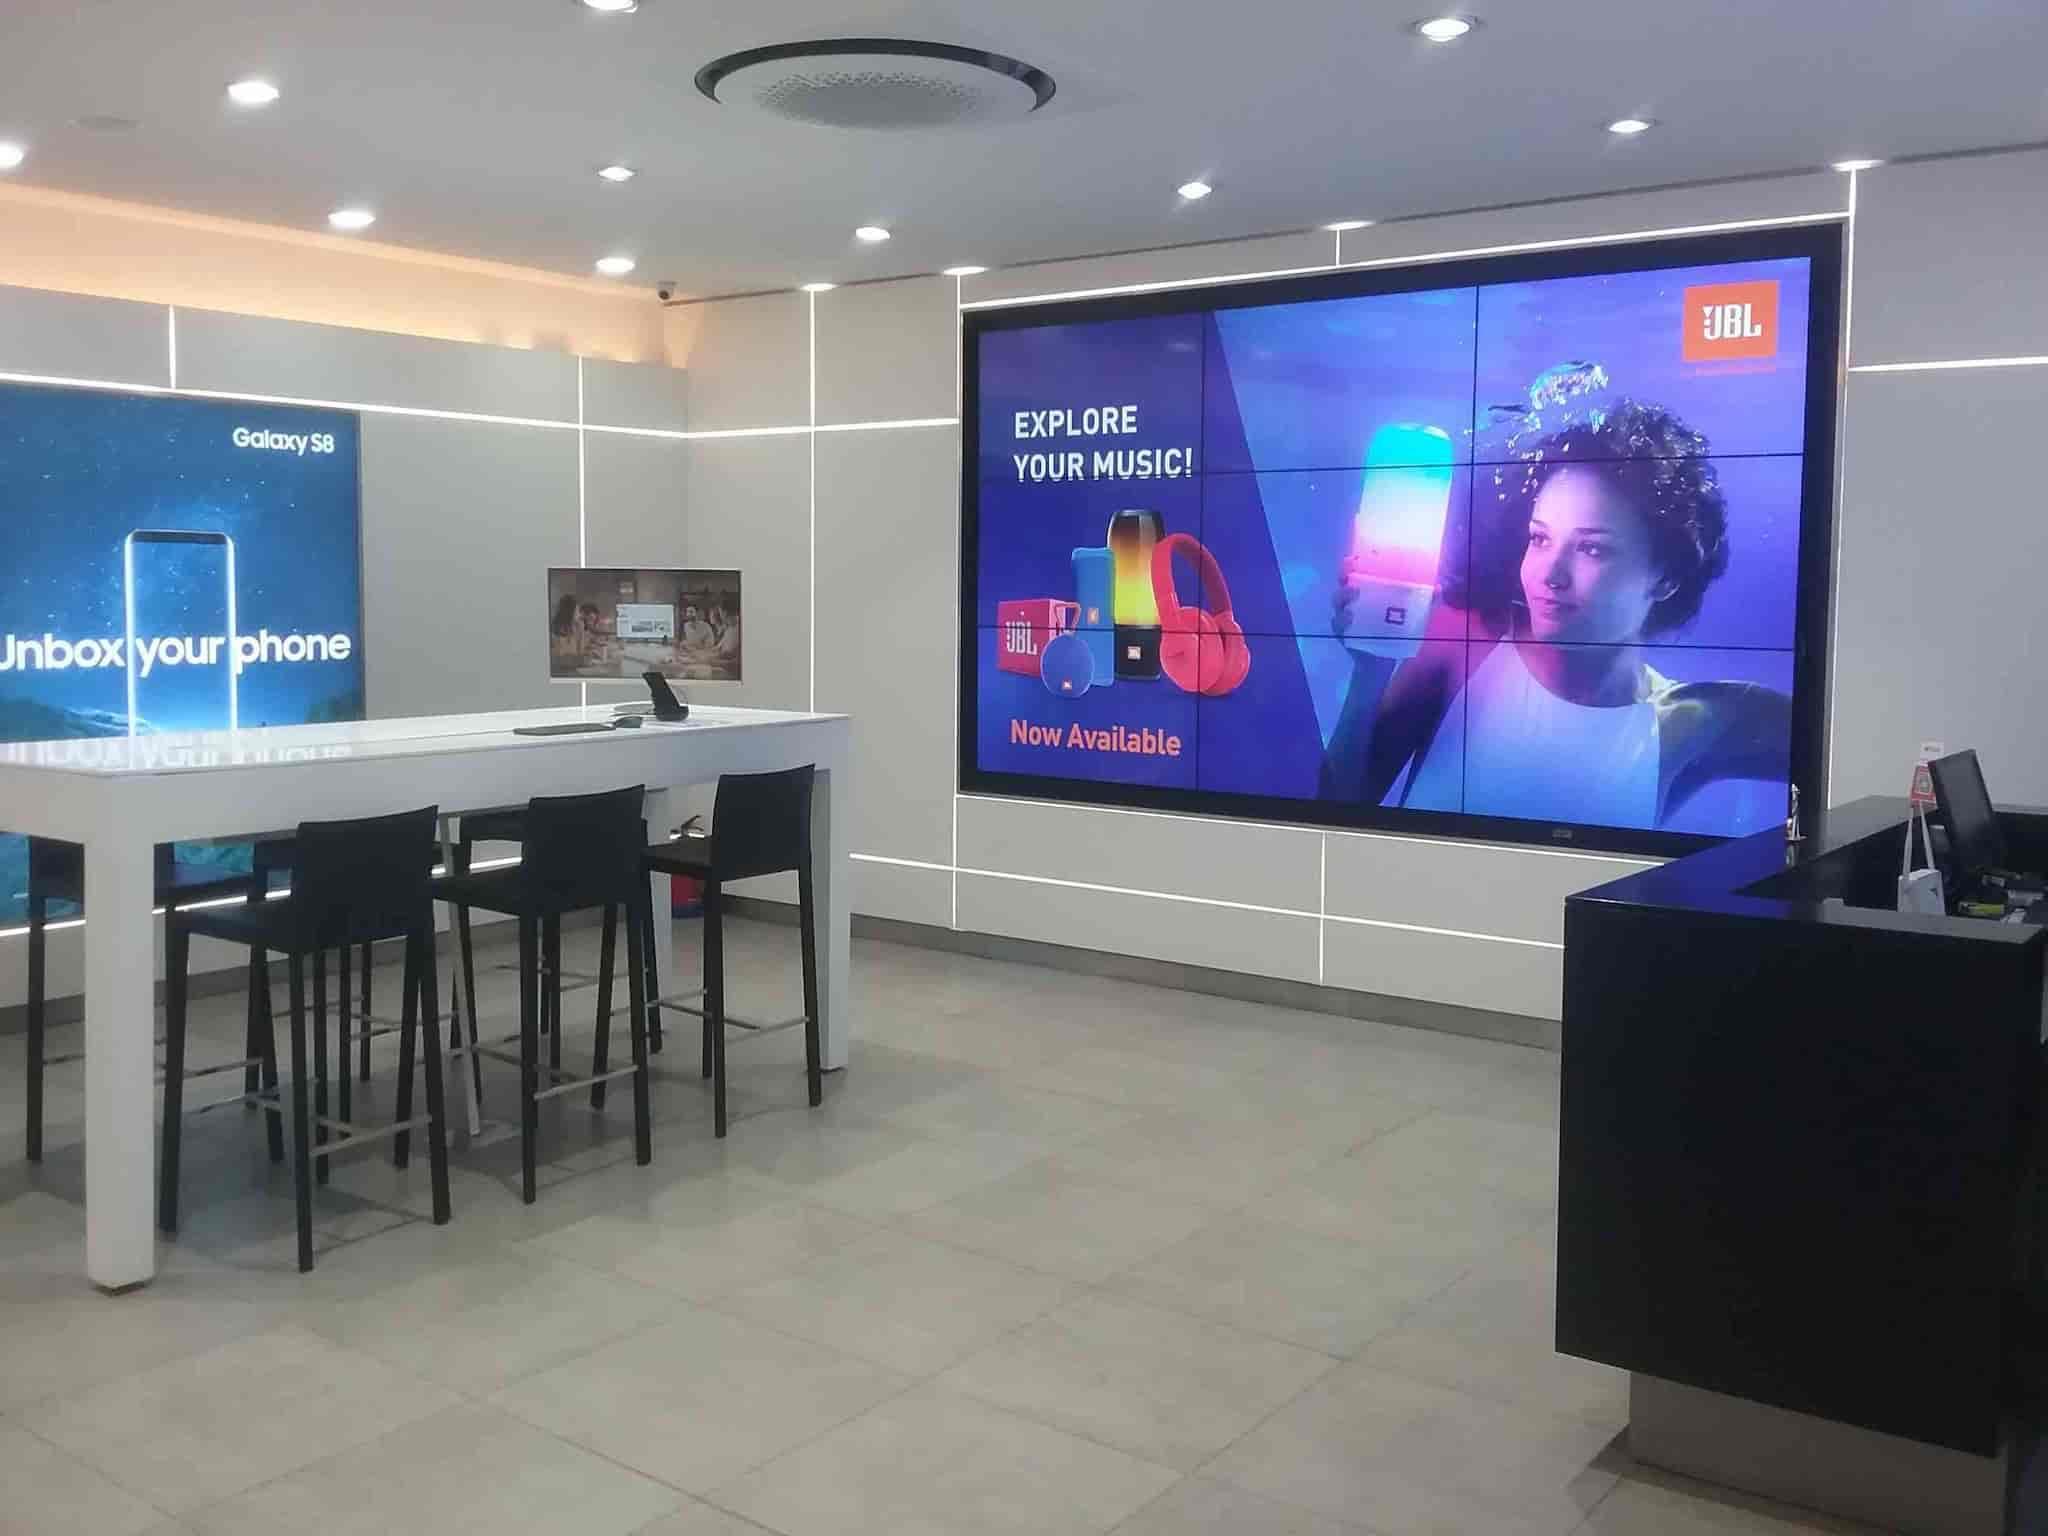 Samsung Premium Brand Store, Sector 35c - Mobile Phone